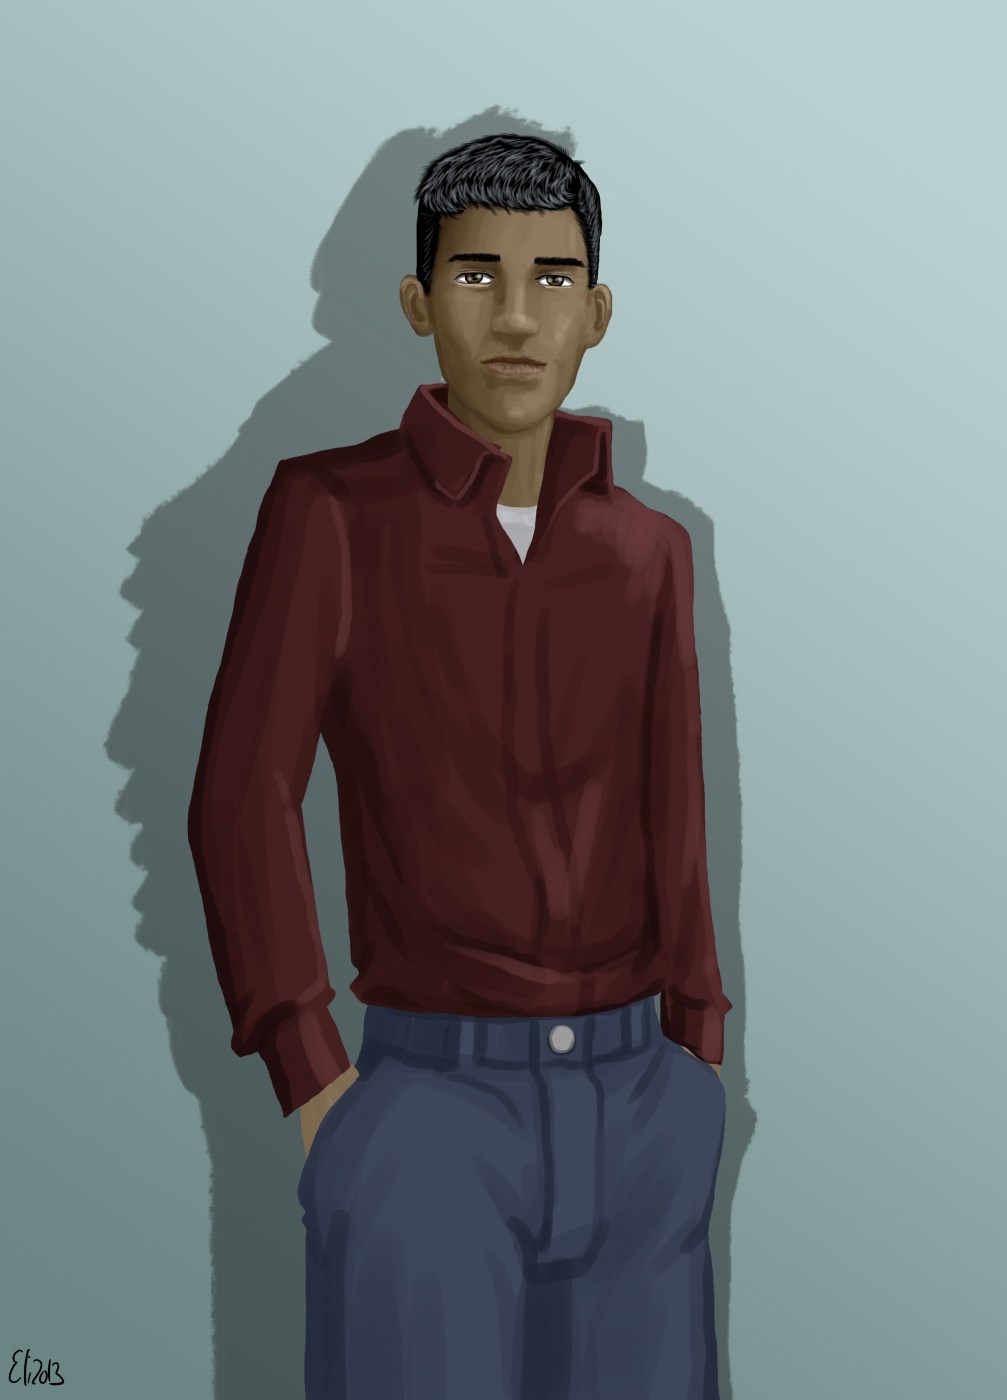 Felipe variant2 by Elikal